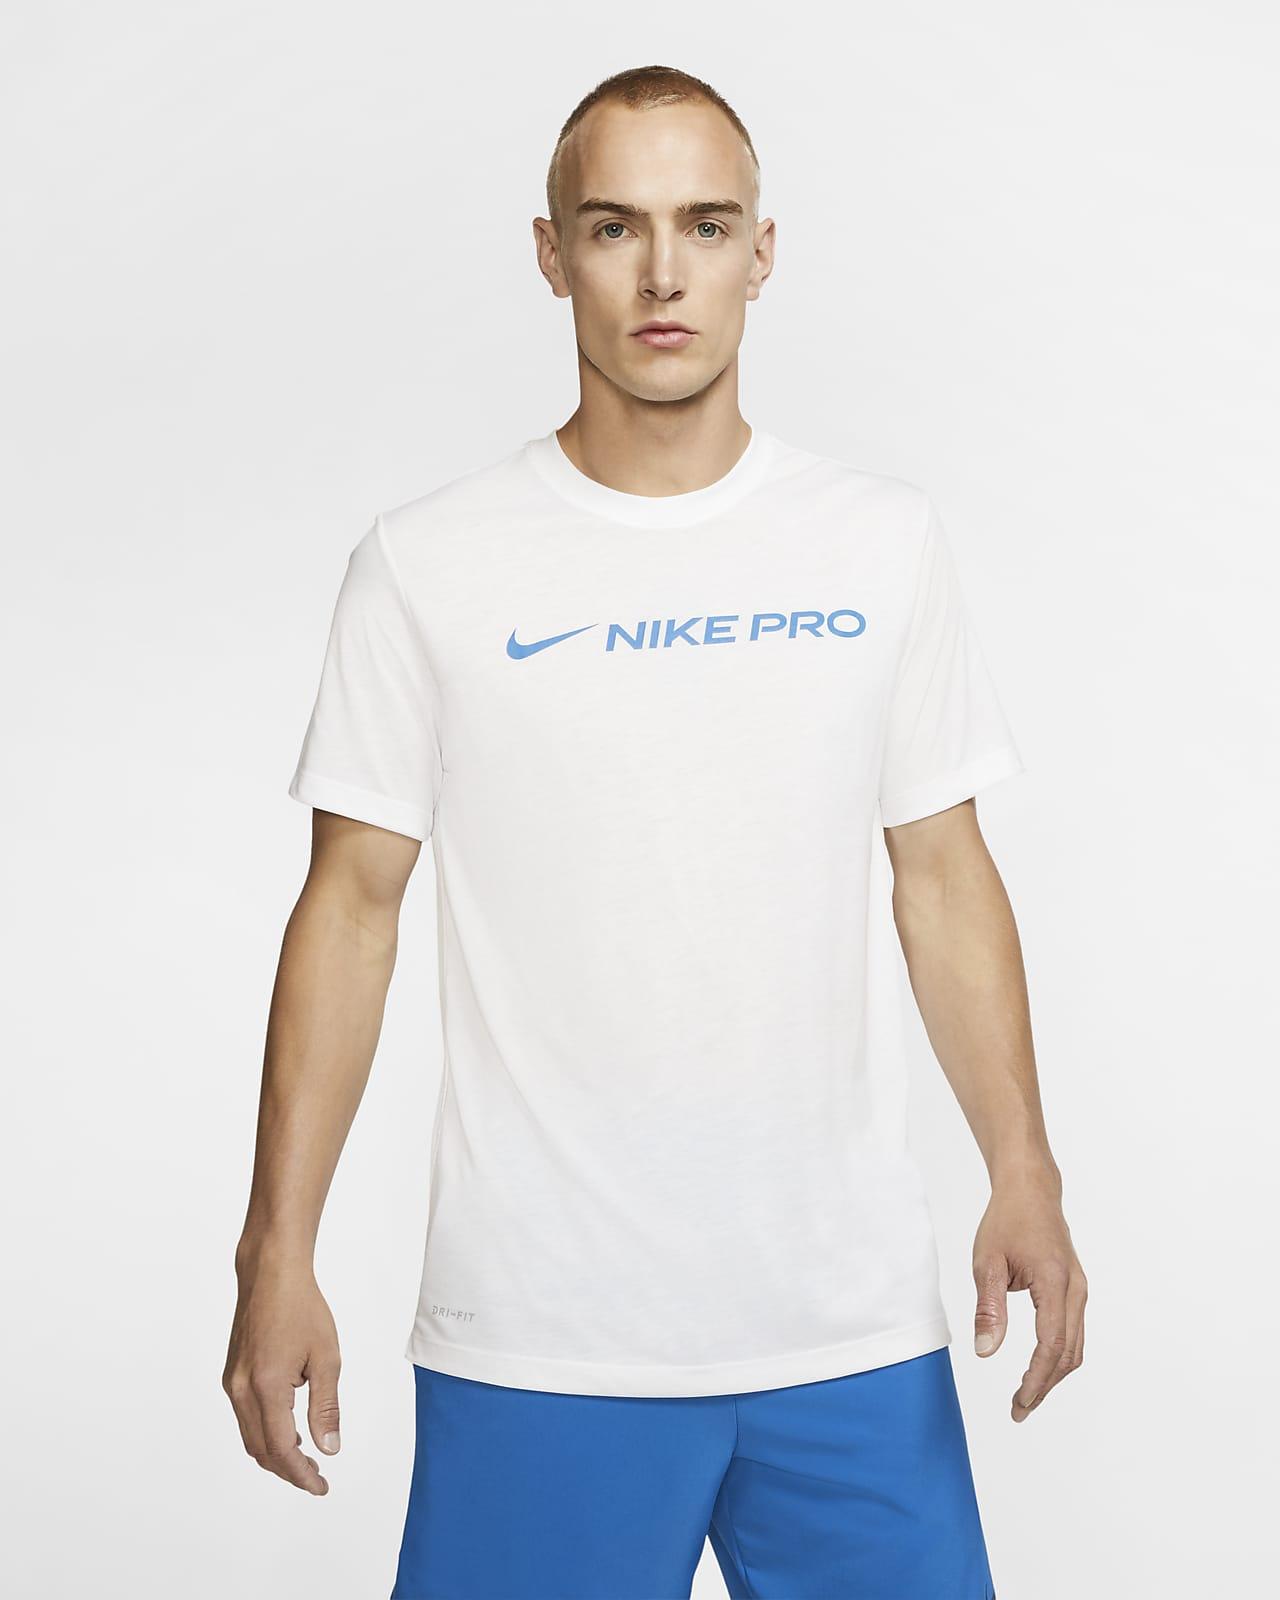 Мужская футболка для тренинга Nike Dri-FIT